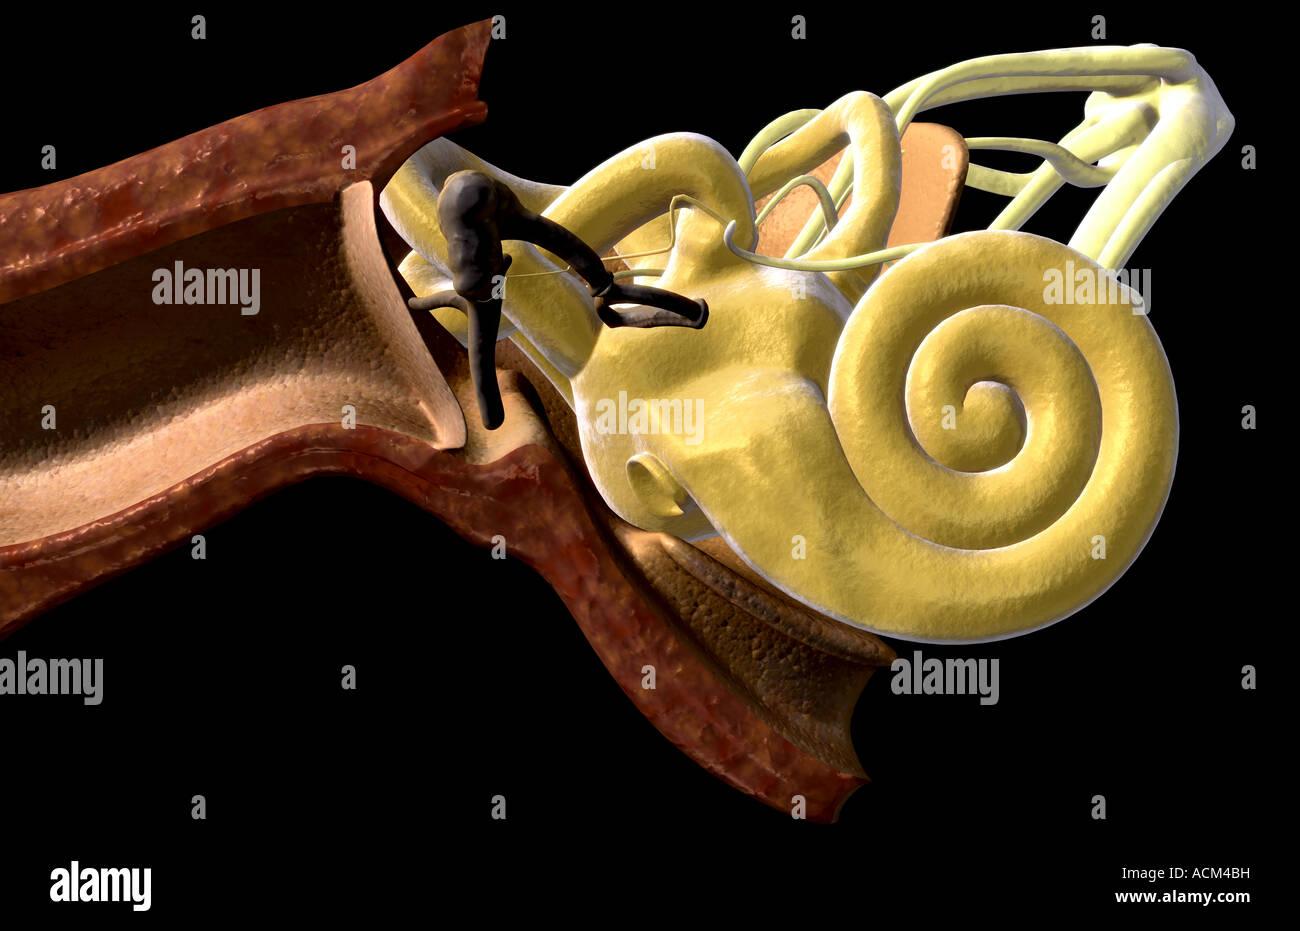 Inner Ear Anatomy Stock Photos & Inner Ear Anatomy Stock Images ...